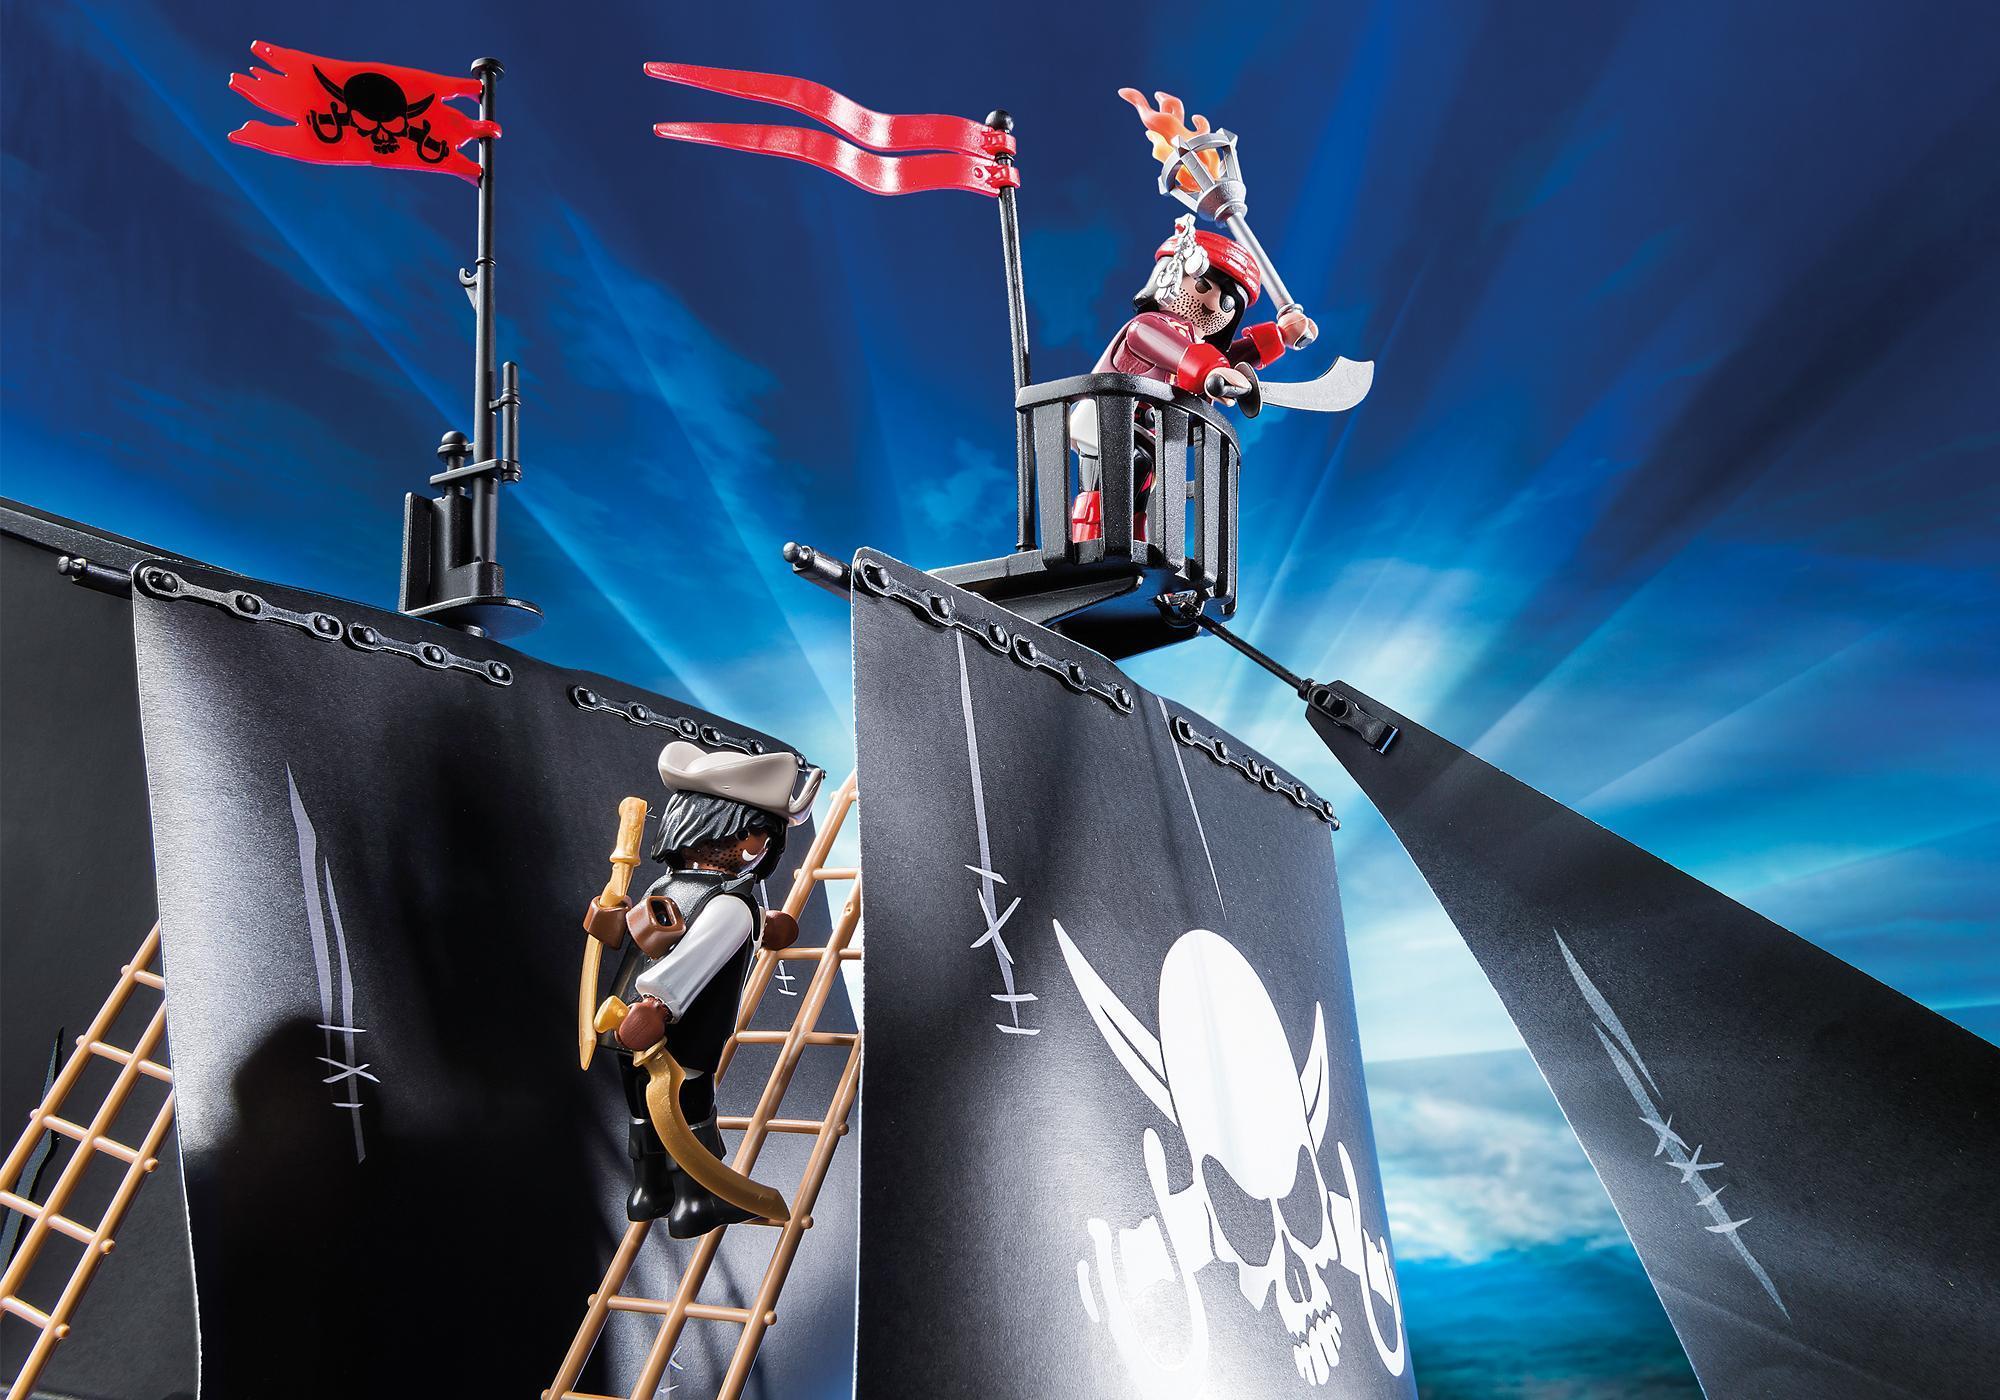 http://media.playmobil.com/i/playmobil/6678_product_extra1/Pirate Raiders' Ship